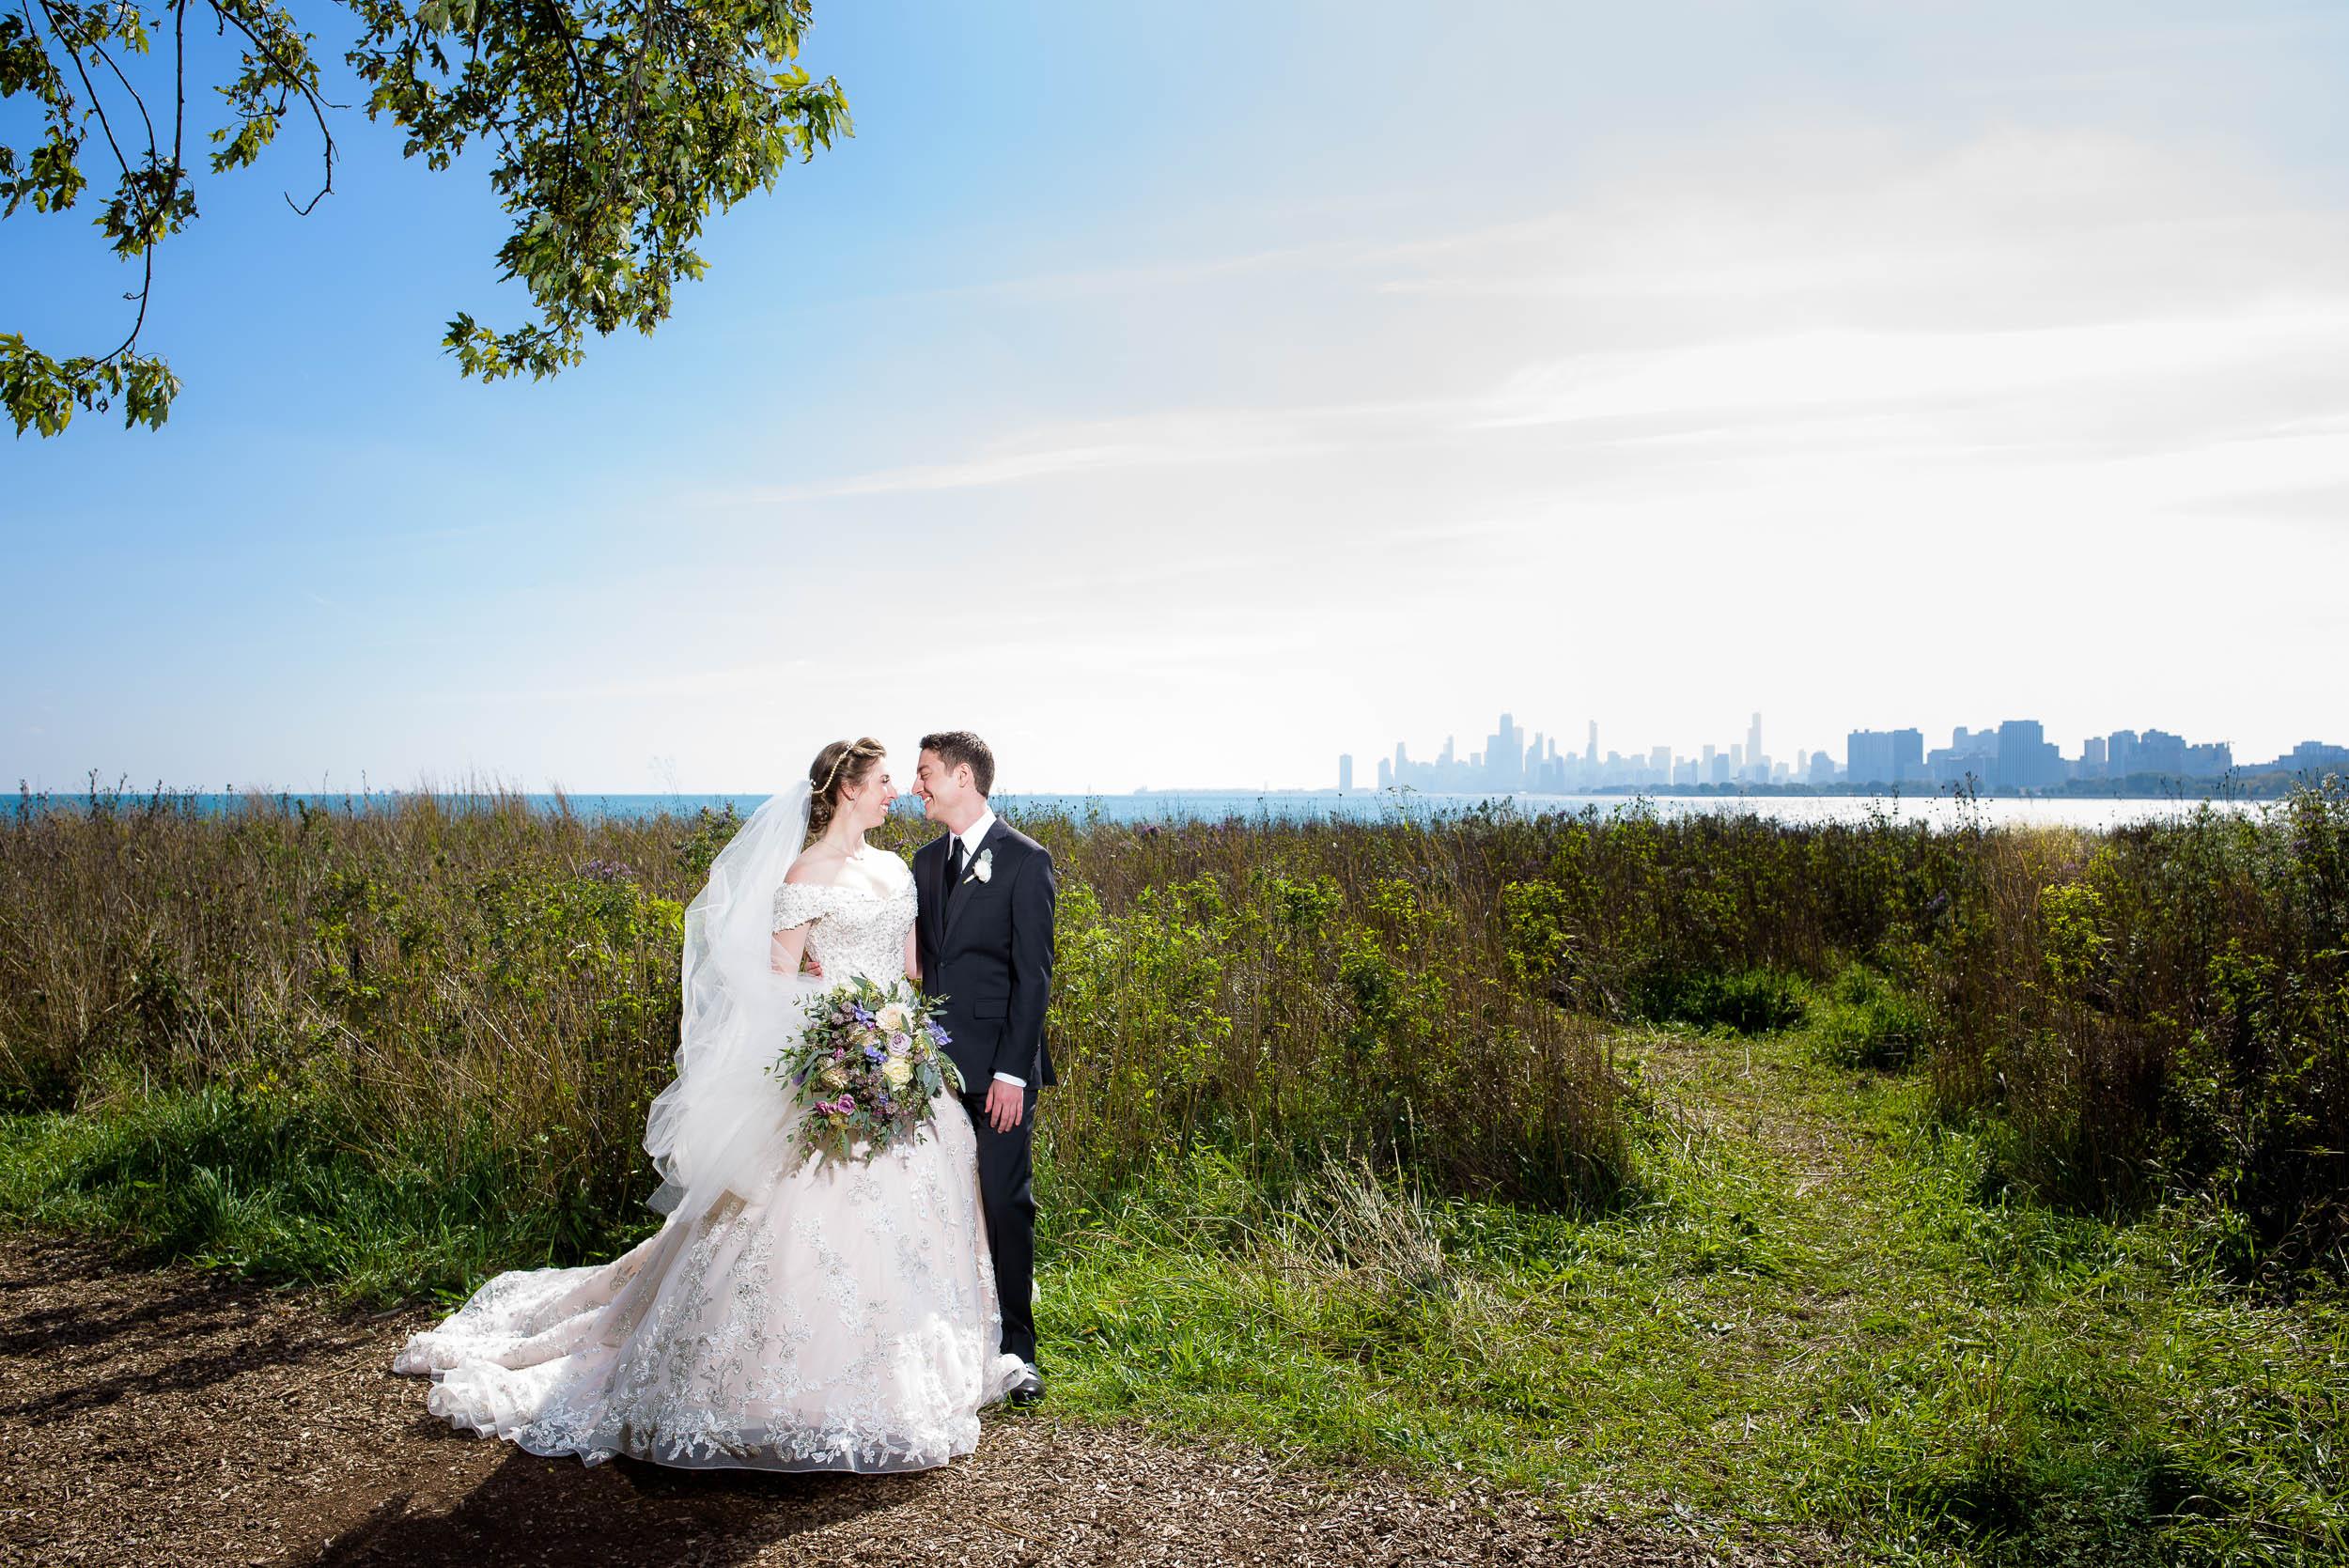 Wedding day portrait at Montrose Harbor Chicago.